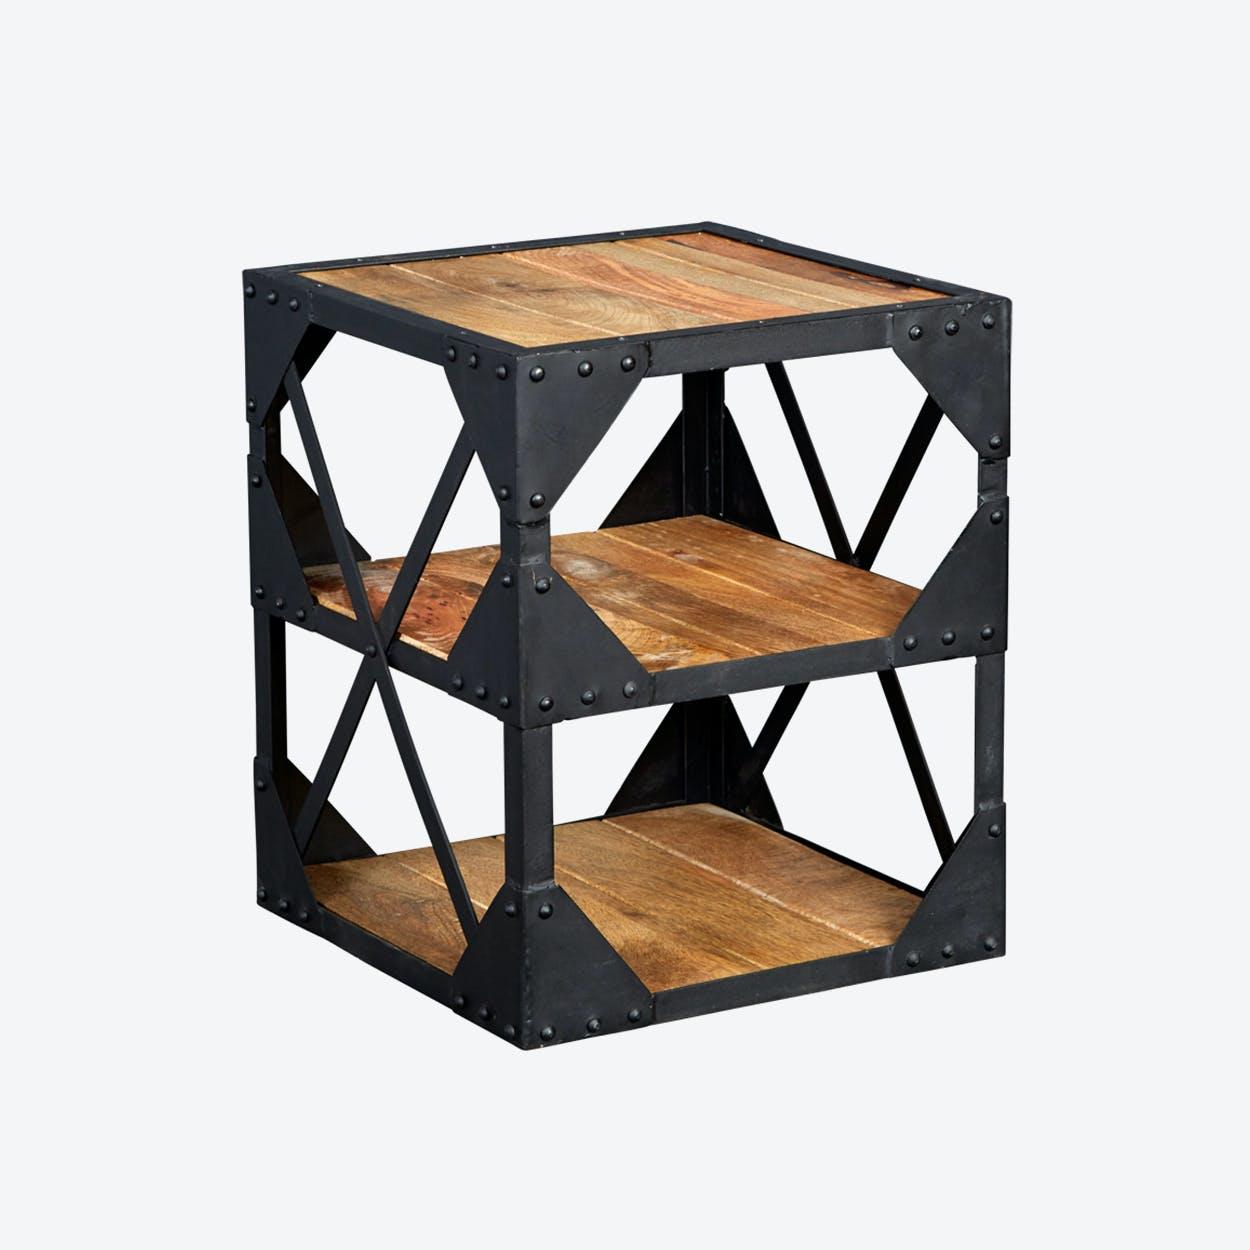 Reclaimed Wood Side Table /Multimedia Cabinet